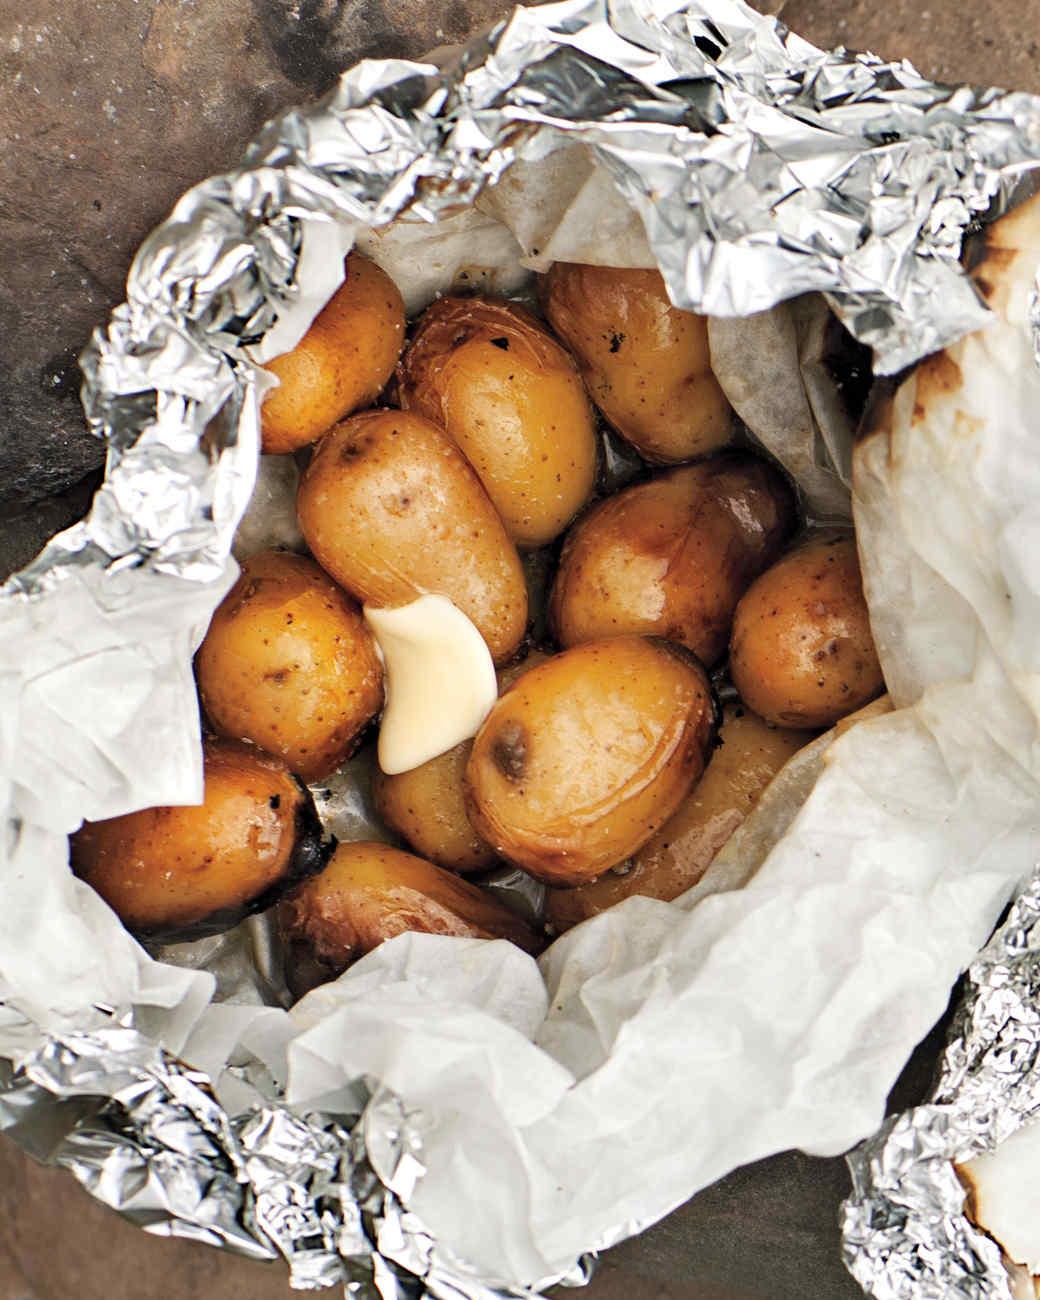 Maine arts camp recipes potatoes